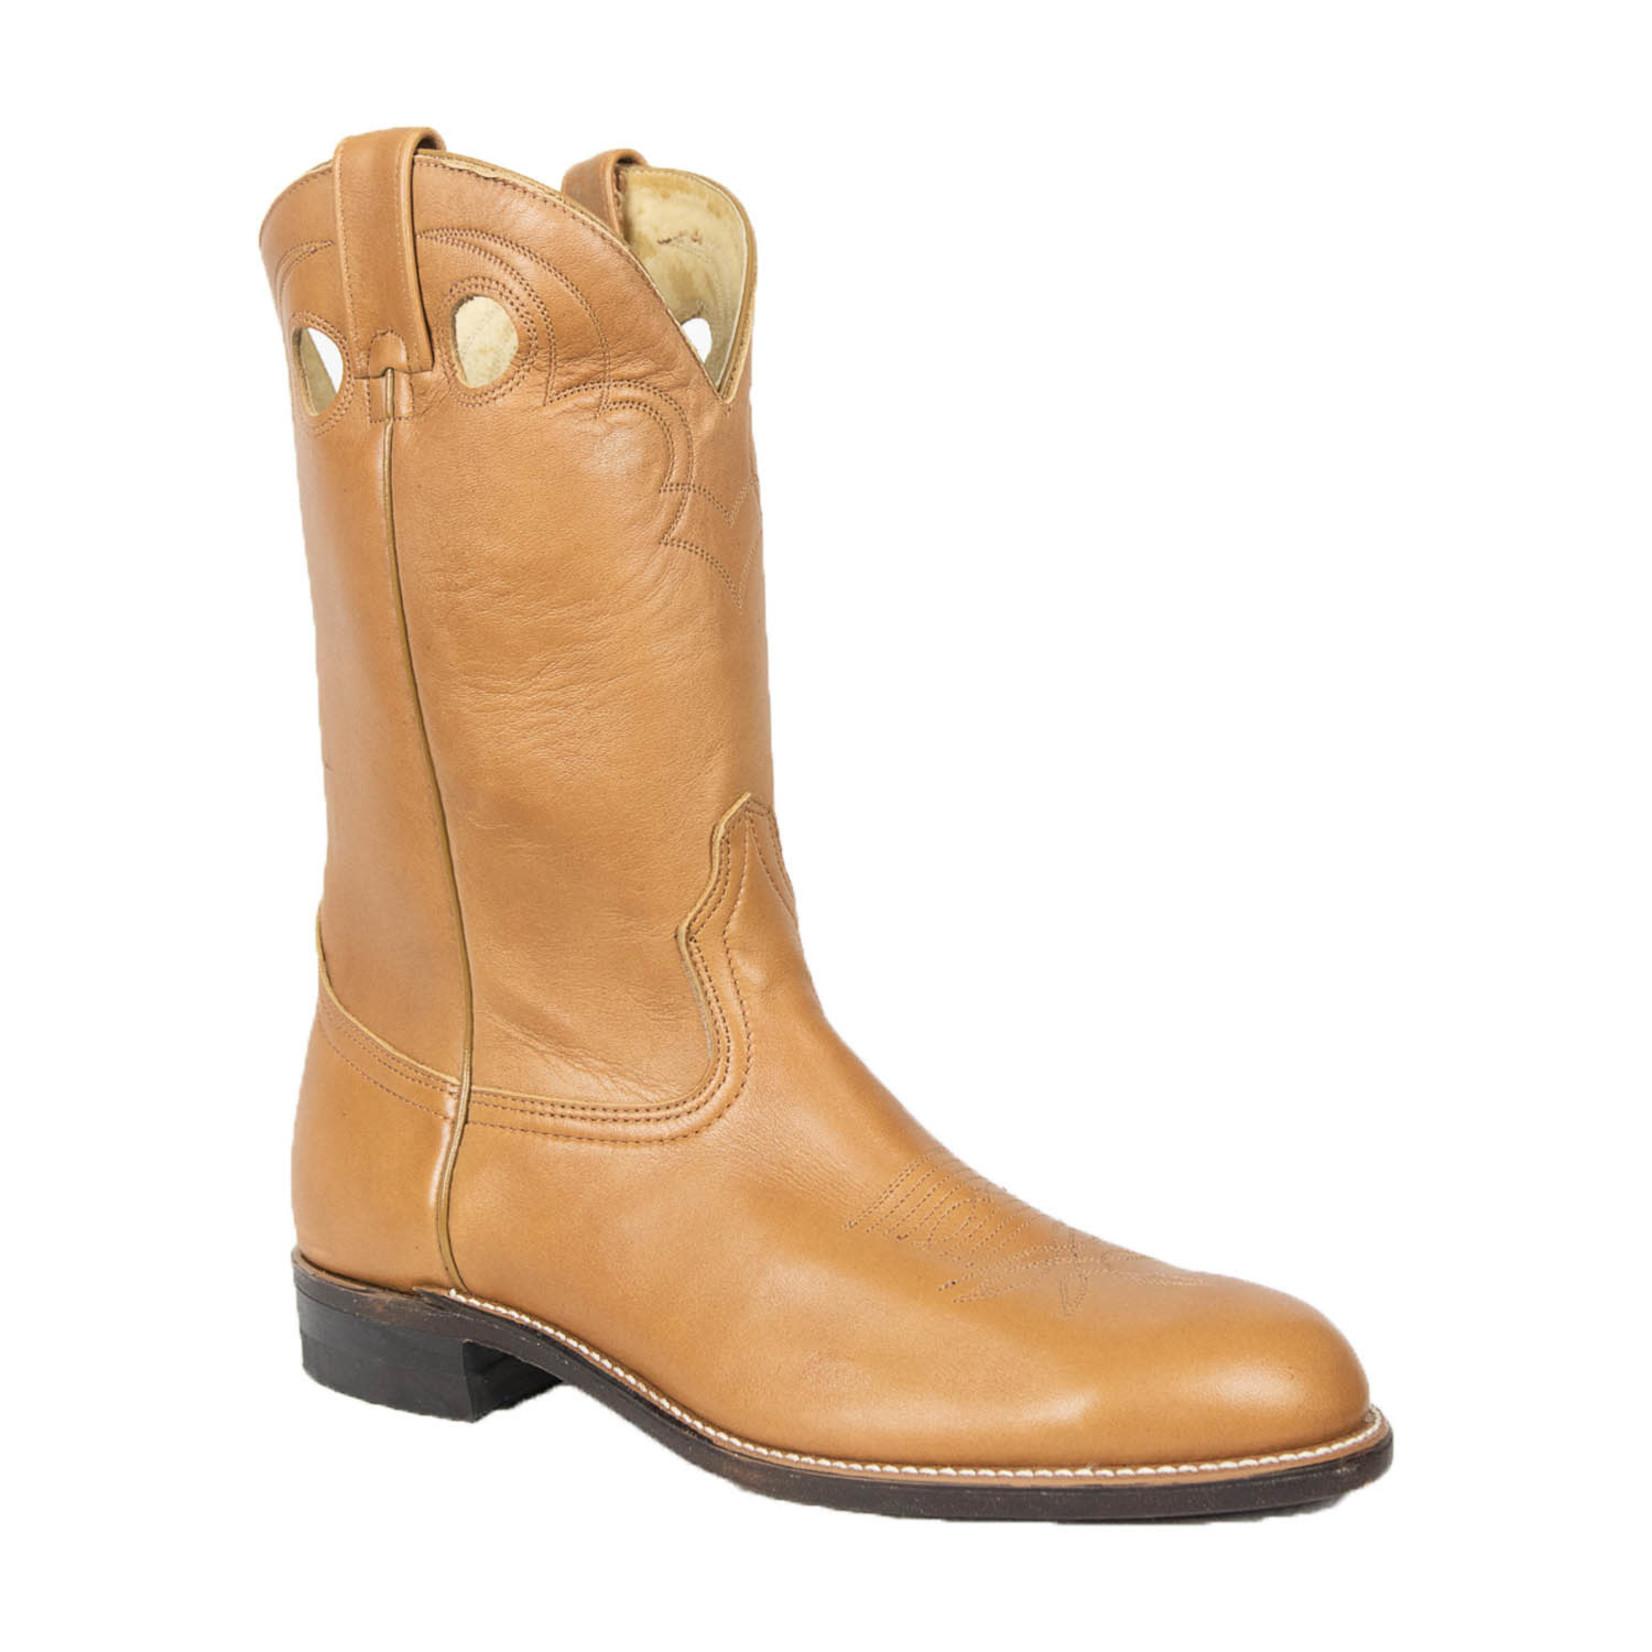 Canada West Canada West Men's Cowboy Boot 77561T 3E